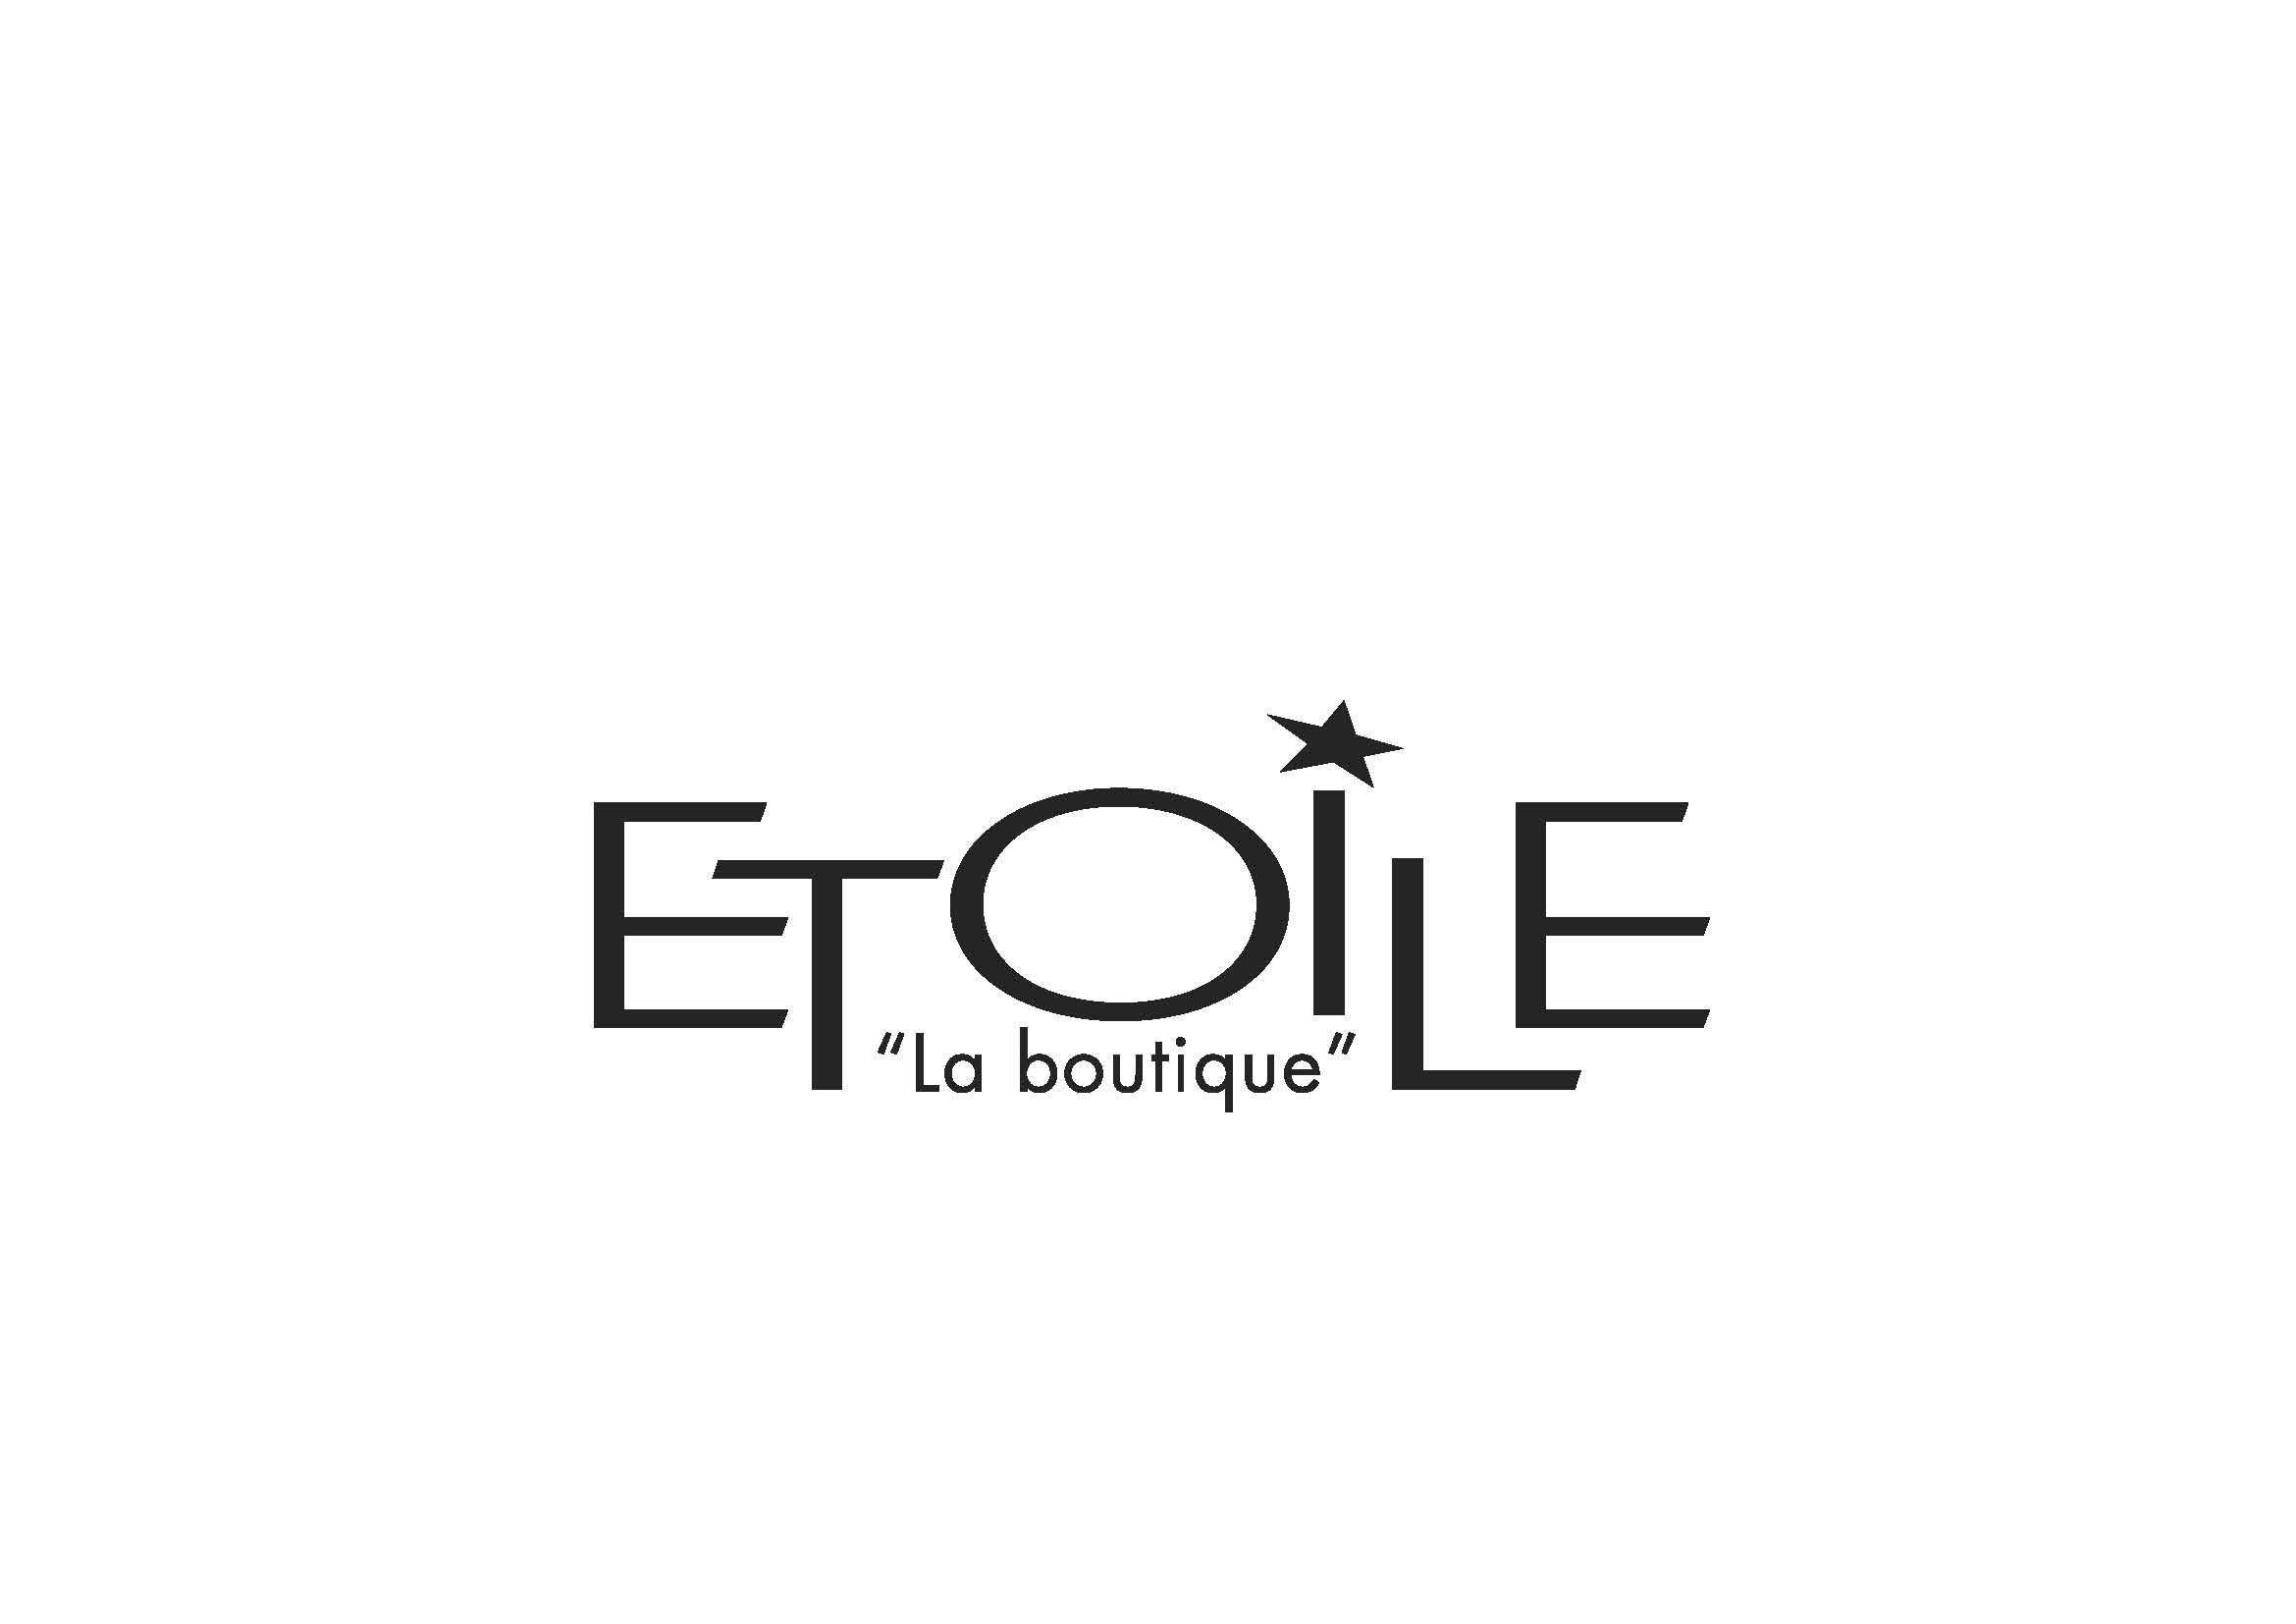 etoile-boutiquelogo-converted.jpg